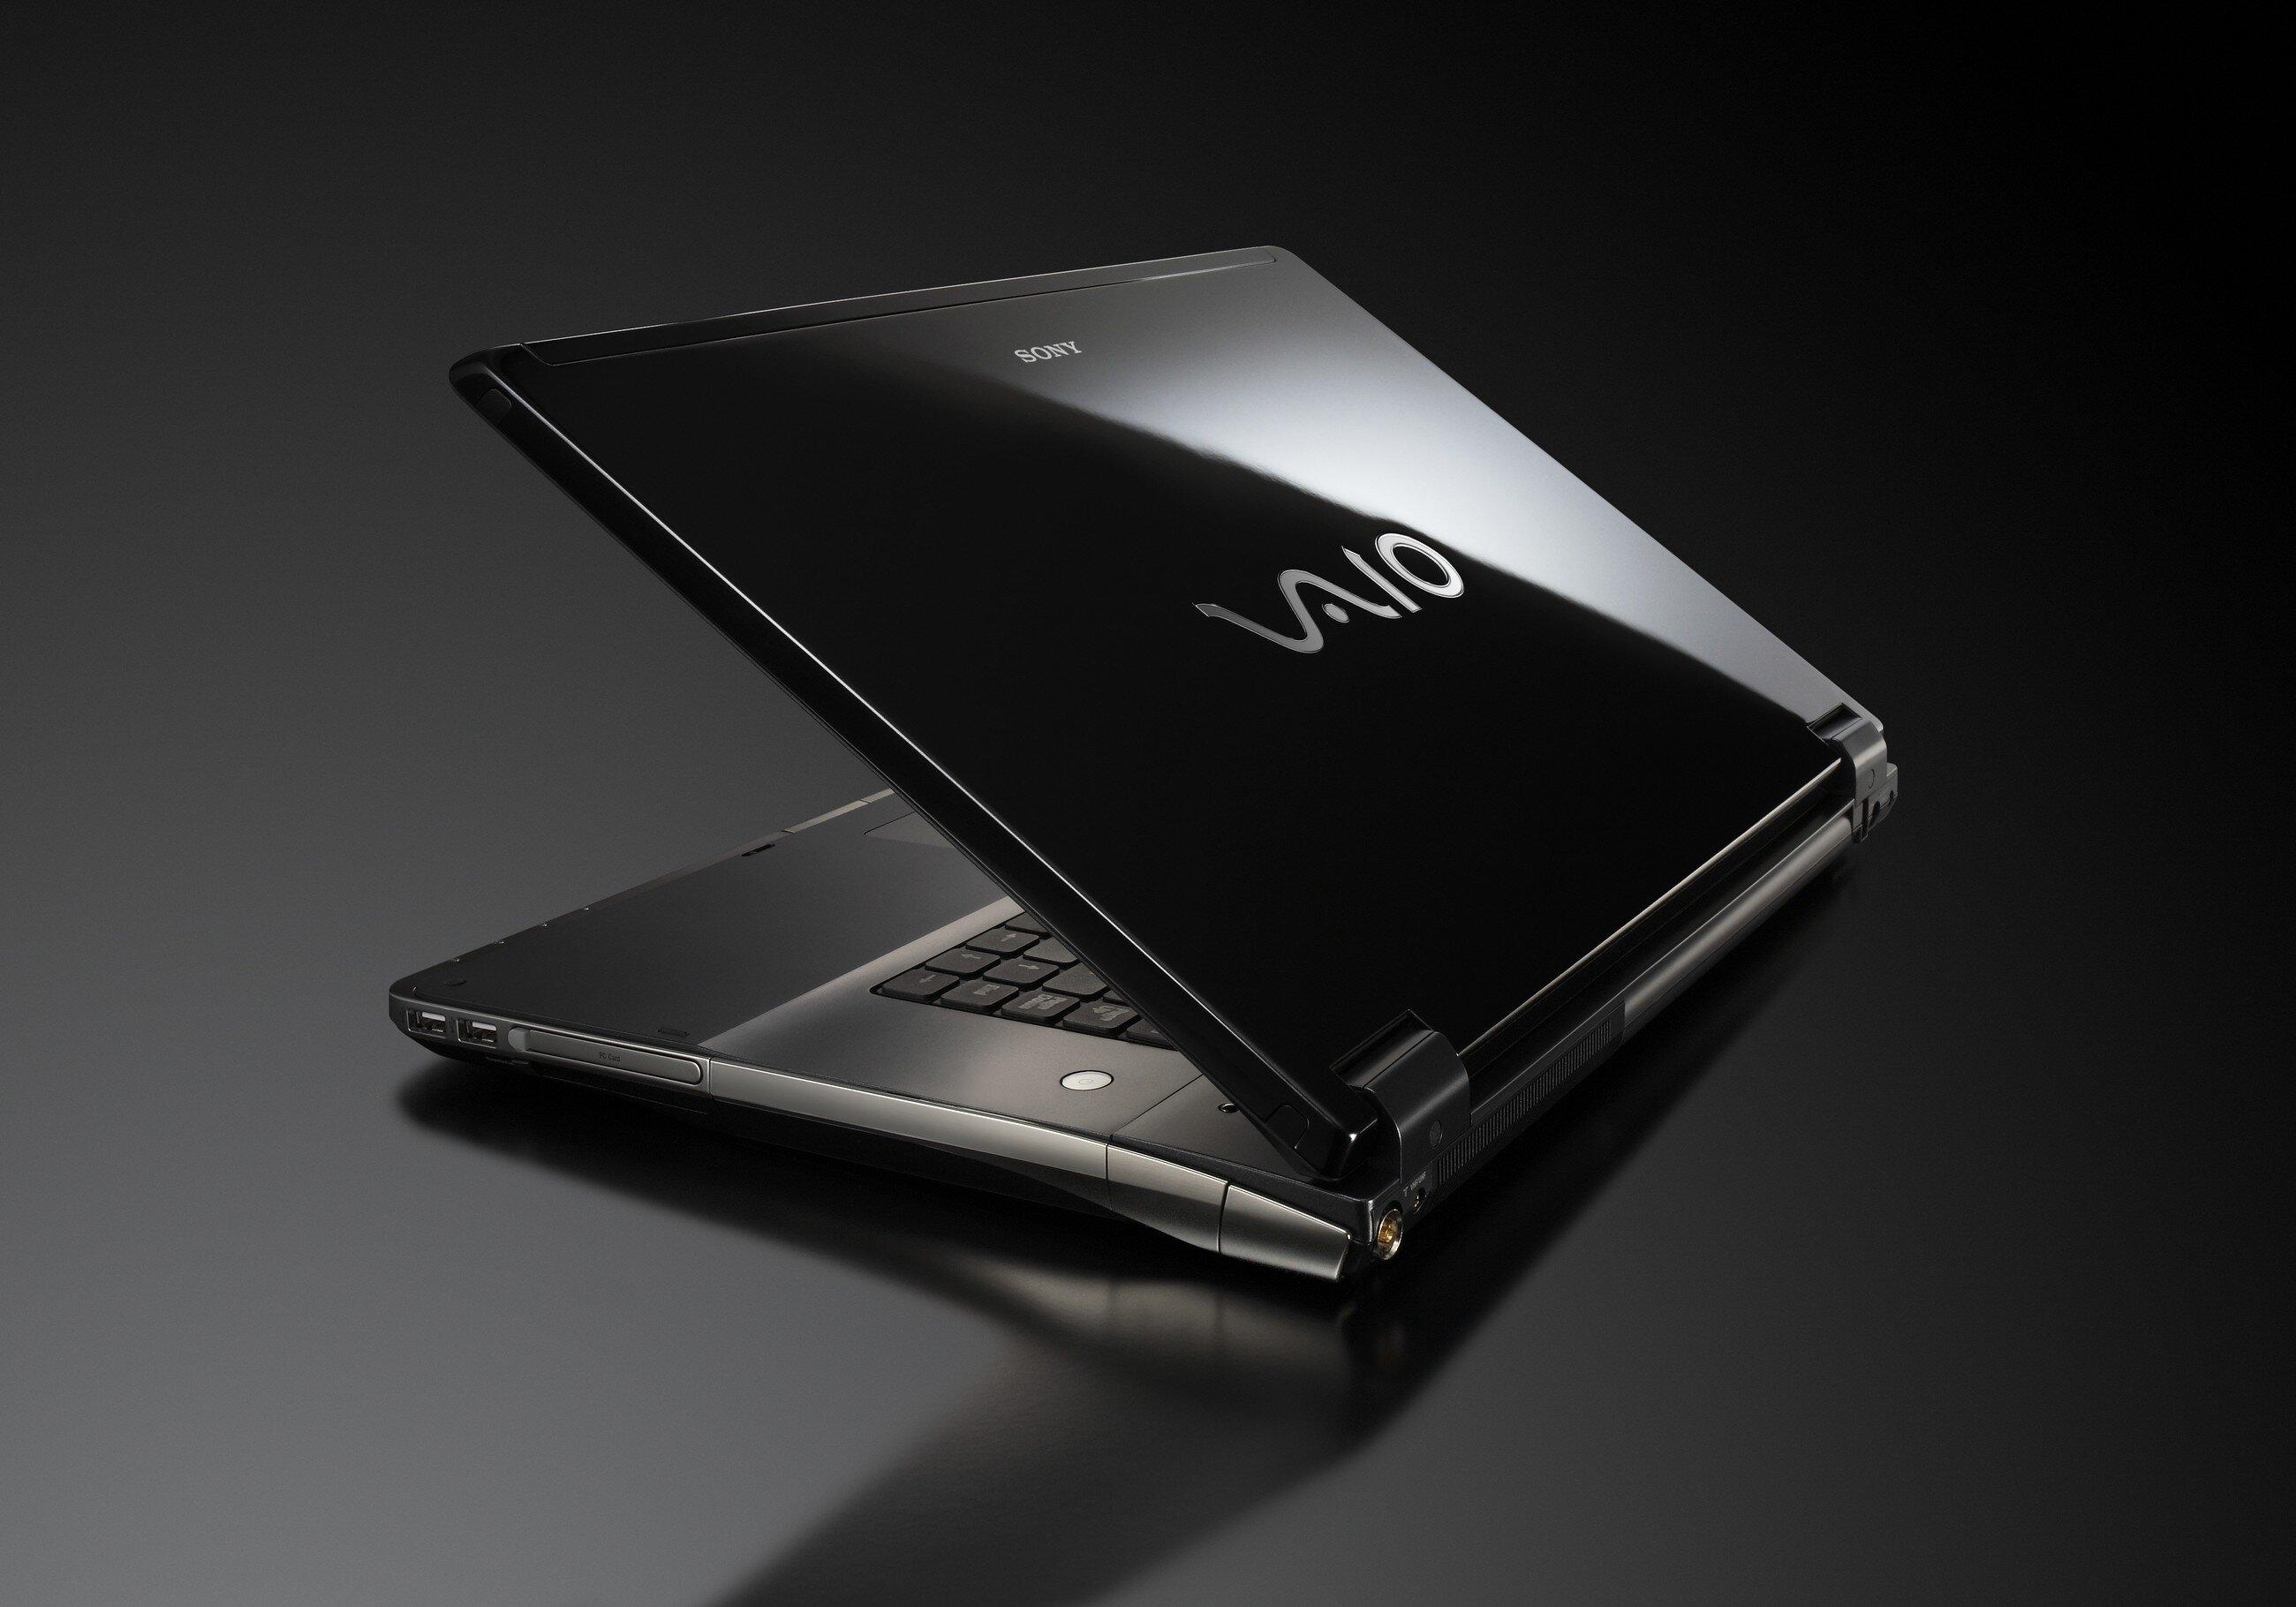 ordinateur portable le moins cher valdiz. Black Bedroom Furniture Sets. Home Design Ideas